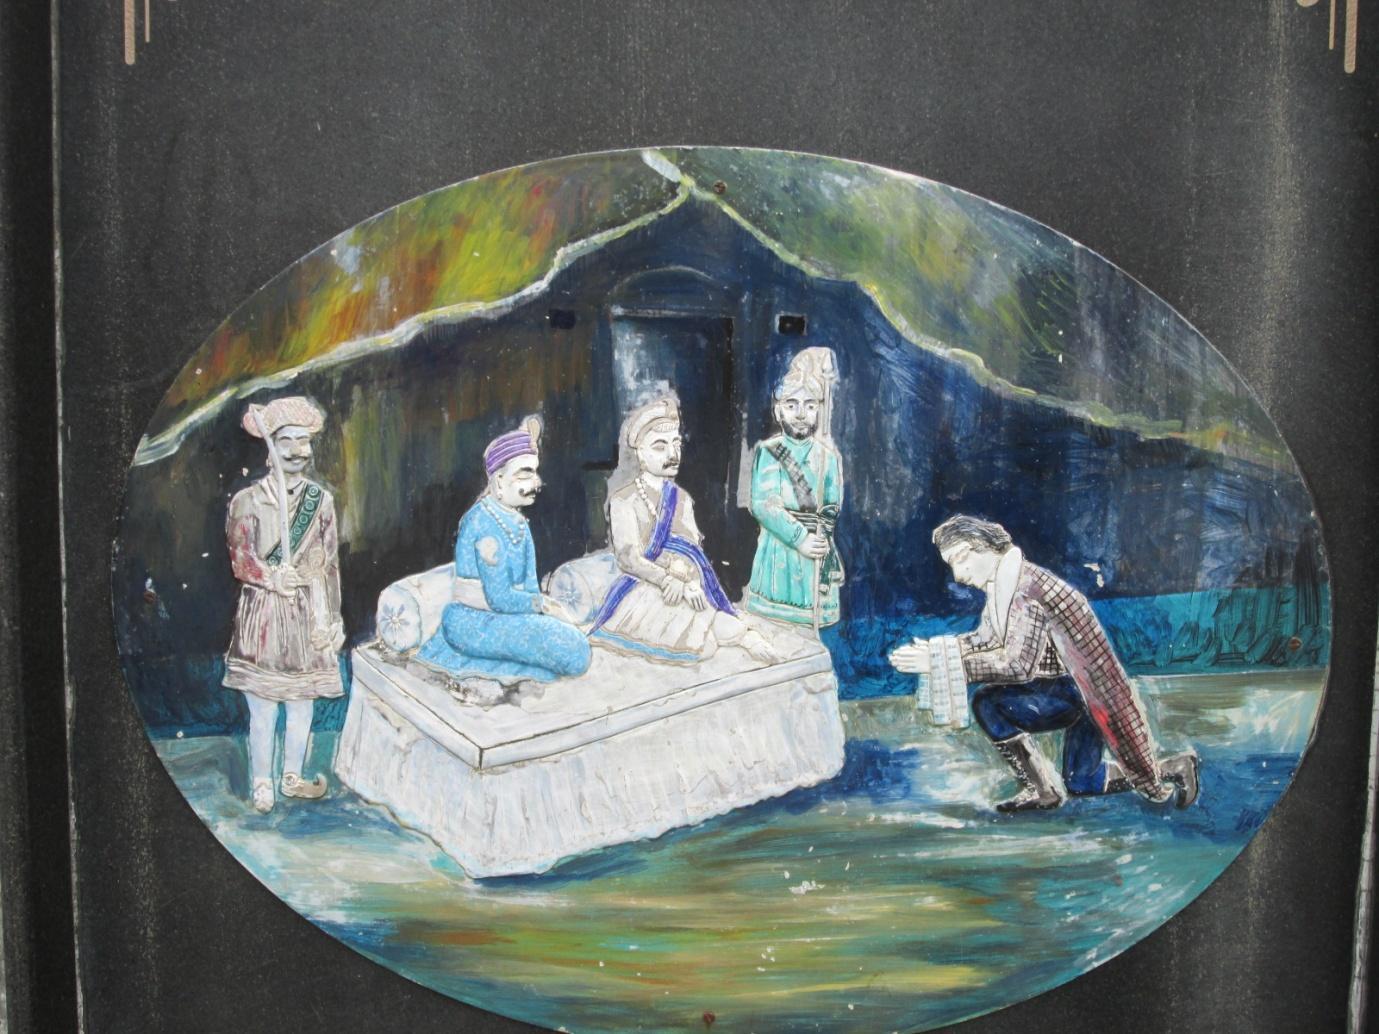 https://upload.wikimedia.org/wikipedia/commons/3/3f/Maratha_British_Treaty.JPG